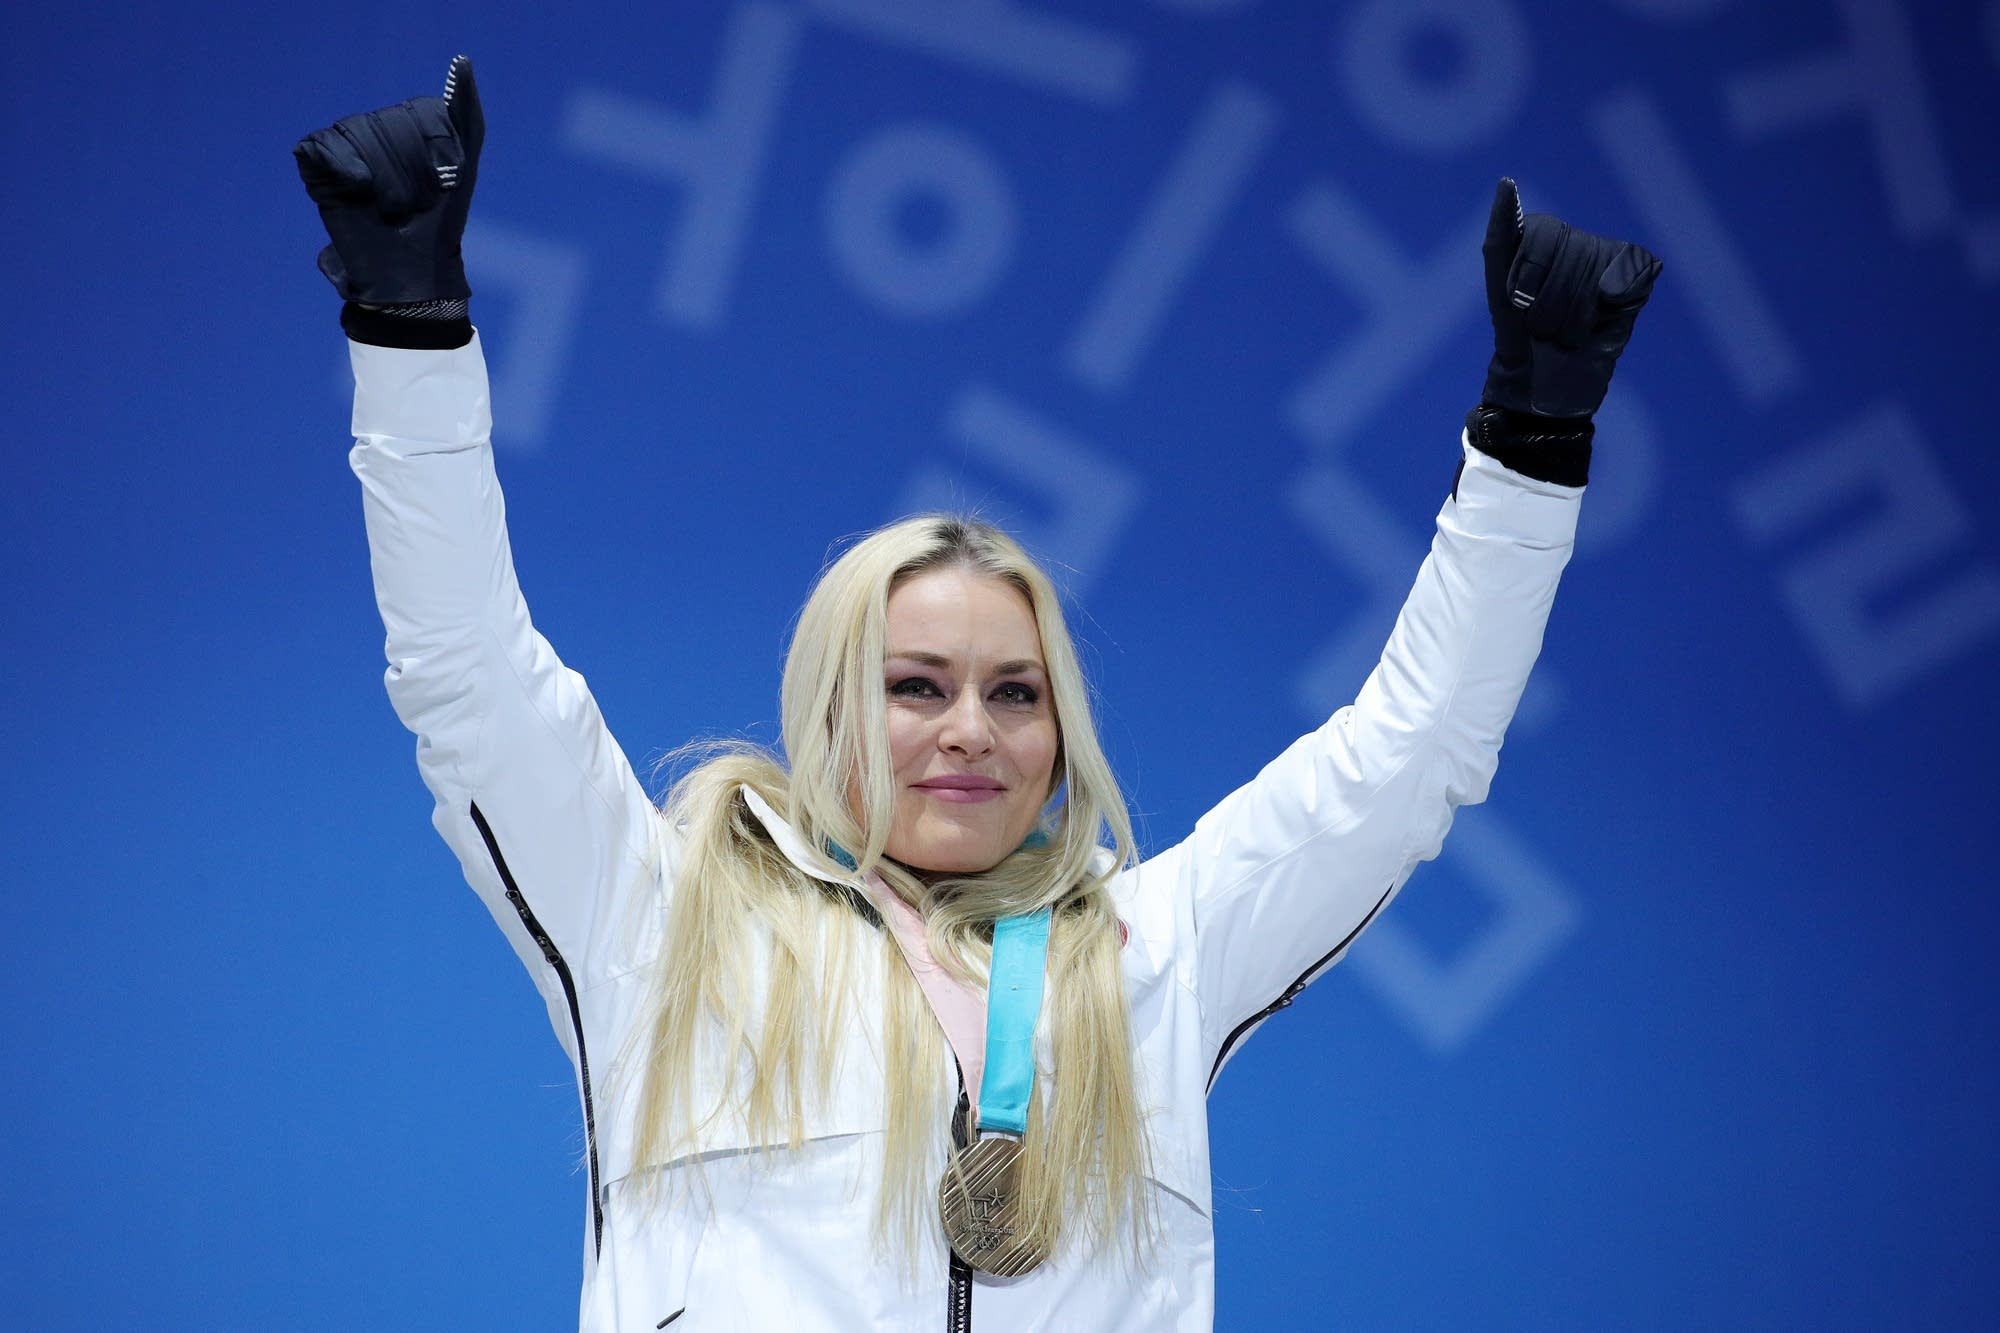 u s  ski coach  lindsey vonn plans to return to racing